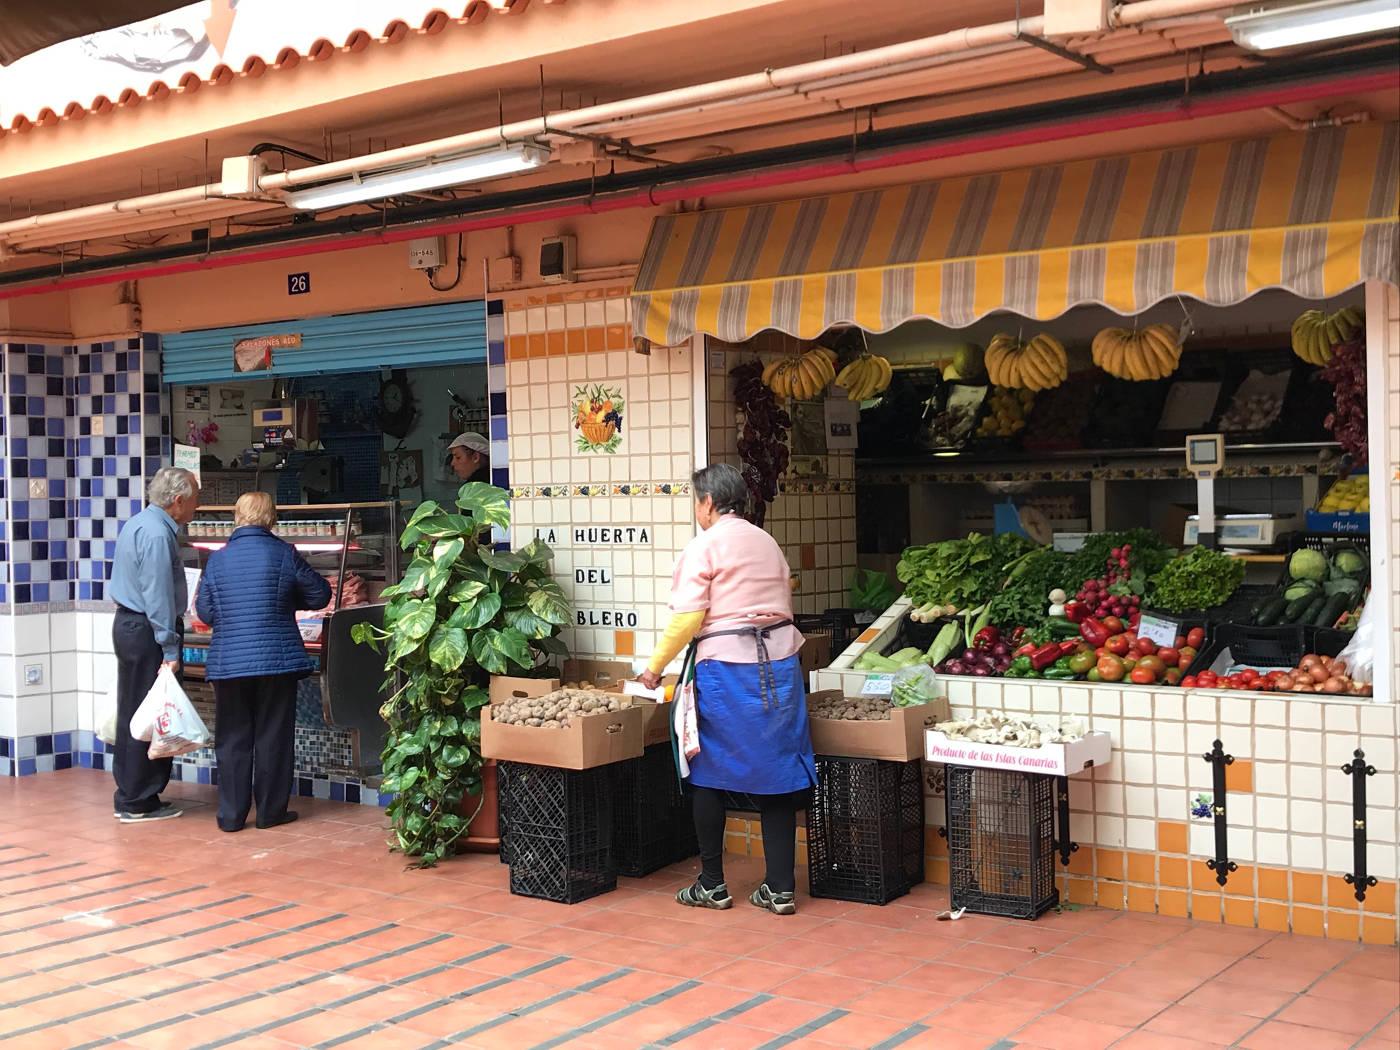 Visite du Mercado de Nuestra Senora de Africa à Santa Cruz de Tenerife